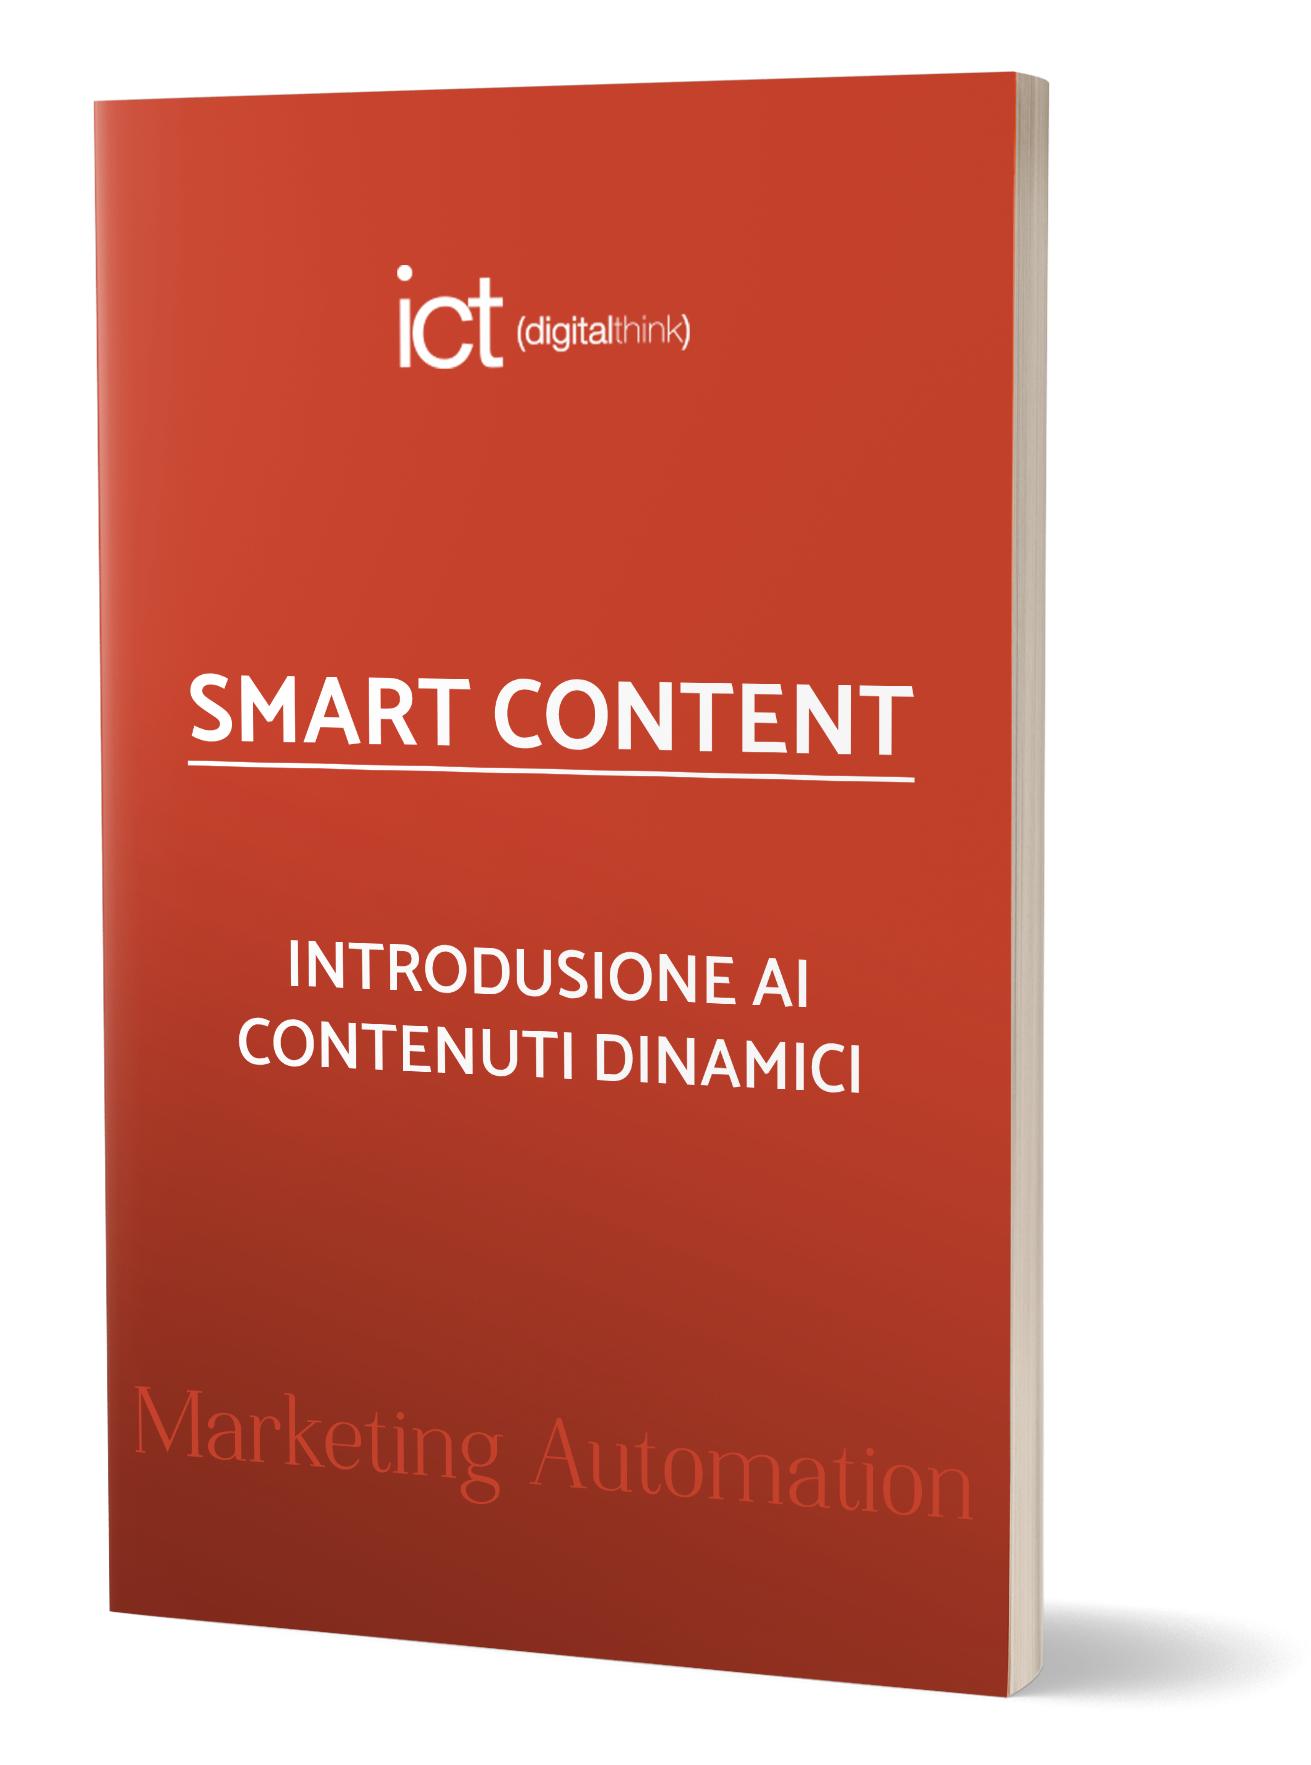 SMART CONTENT: Introduzione ai contenuti dinamici